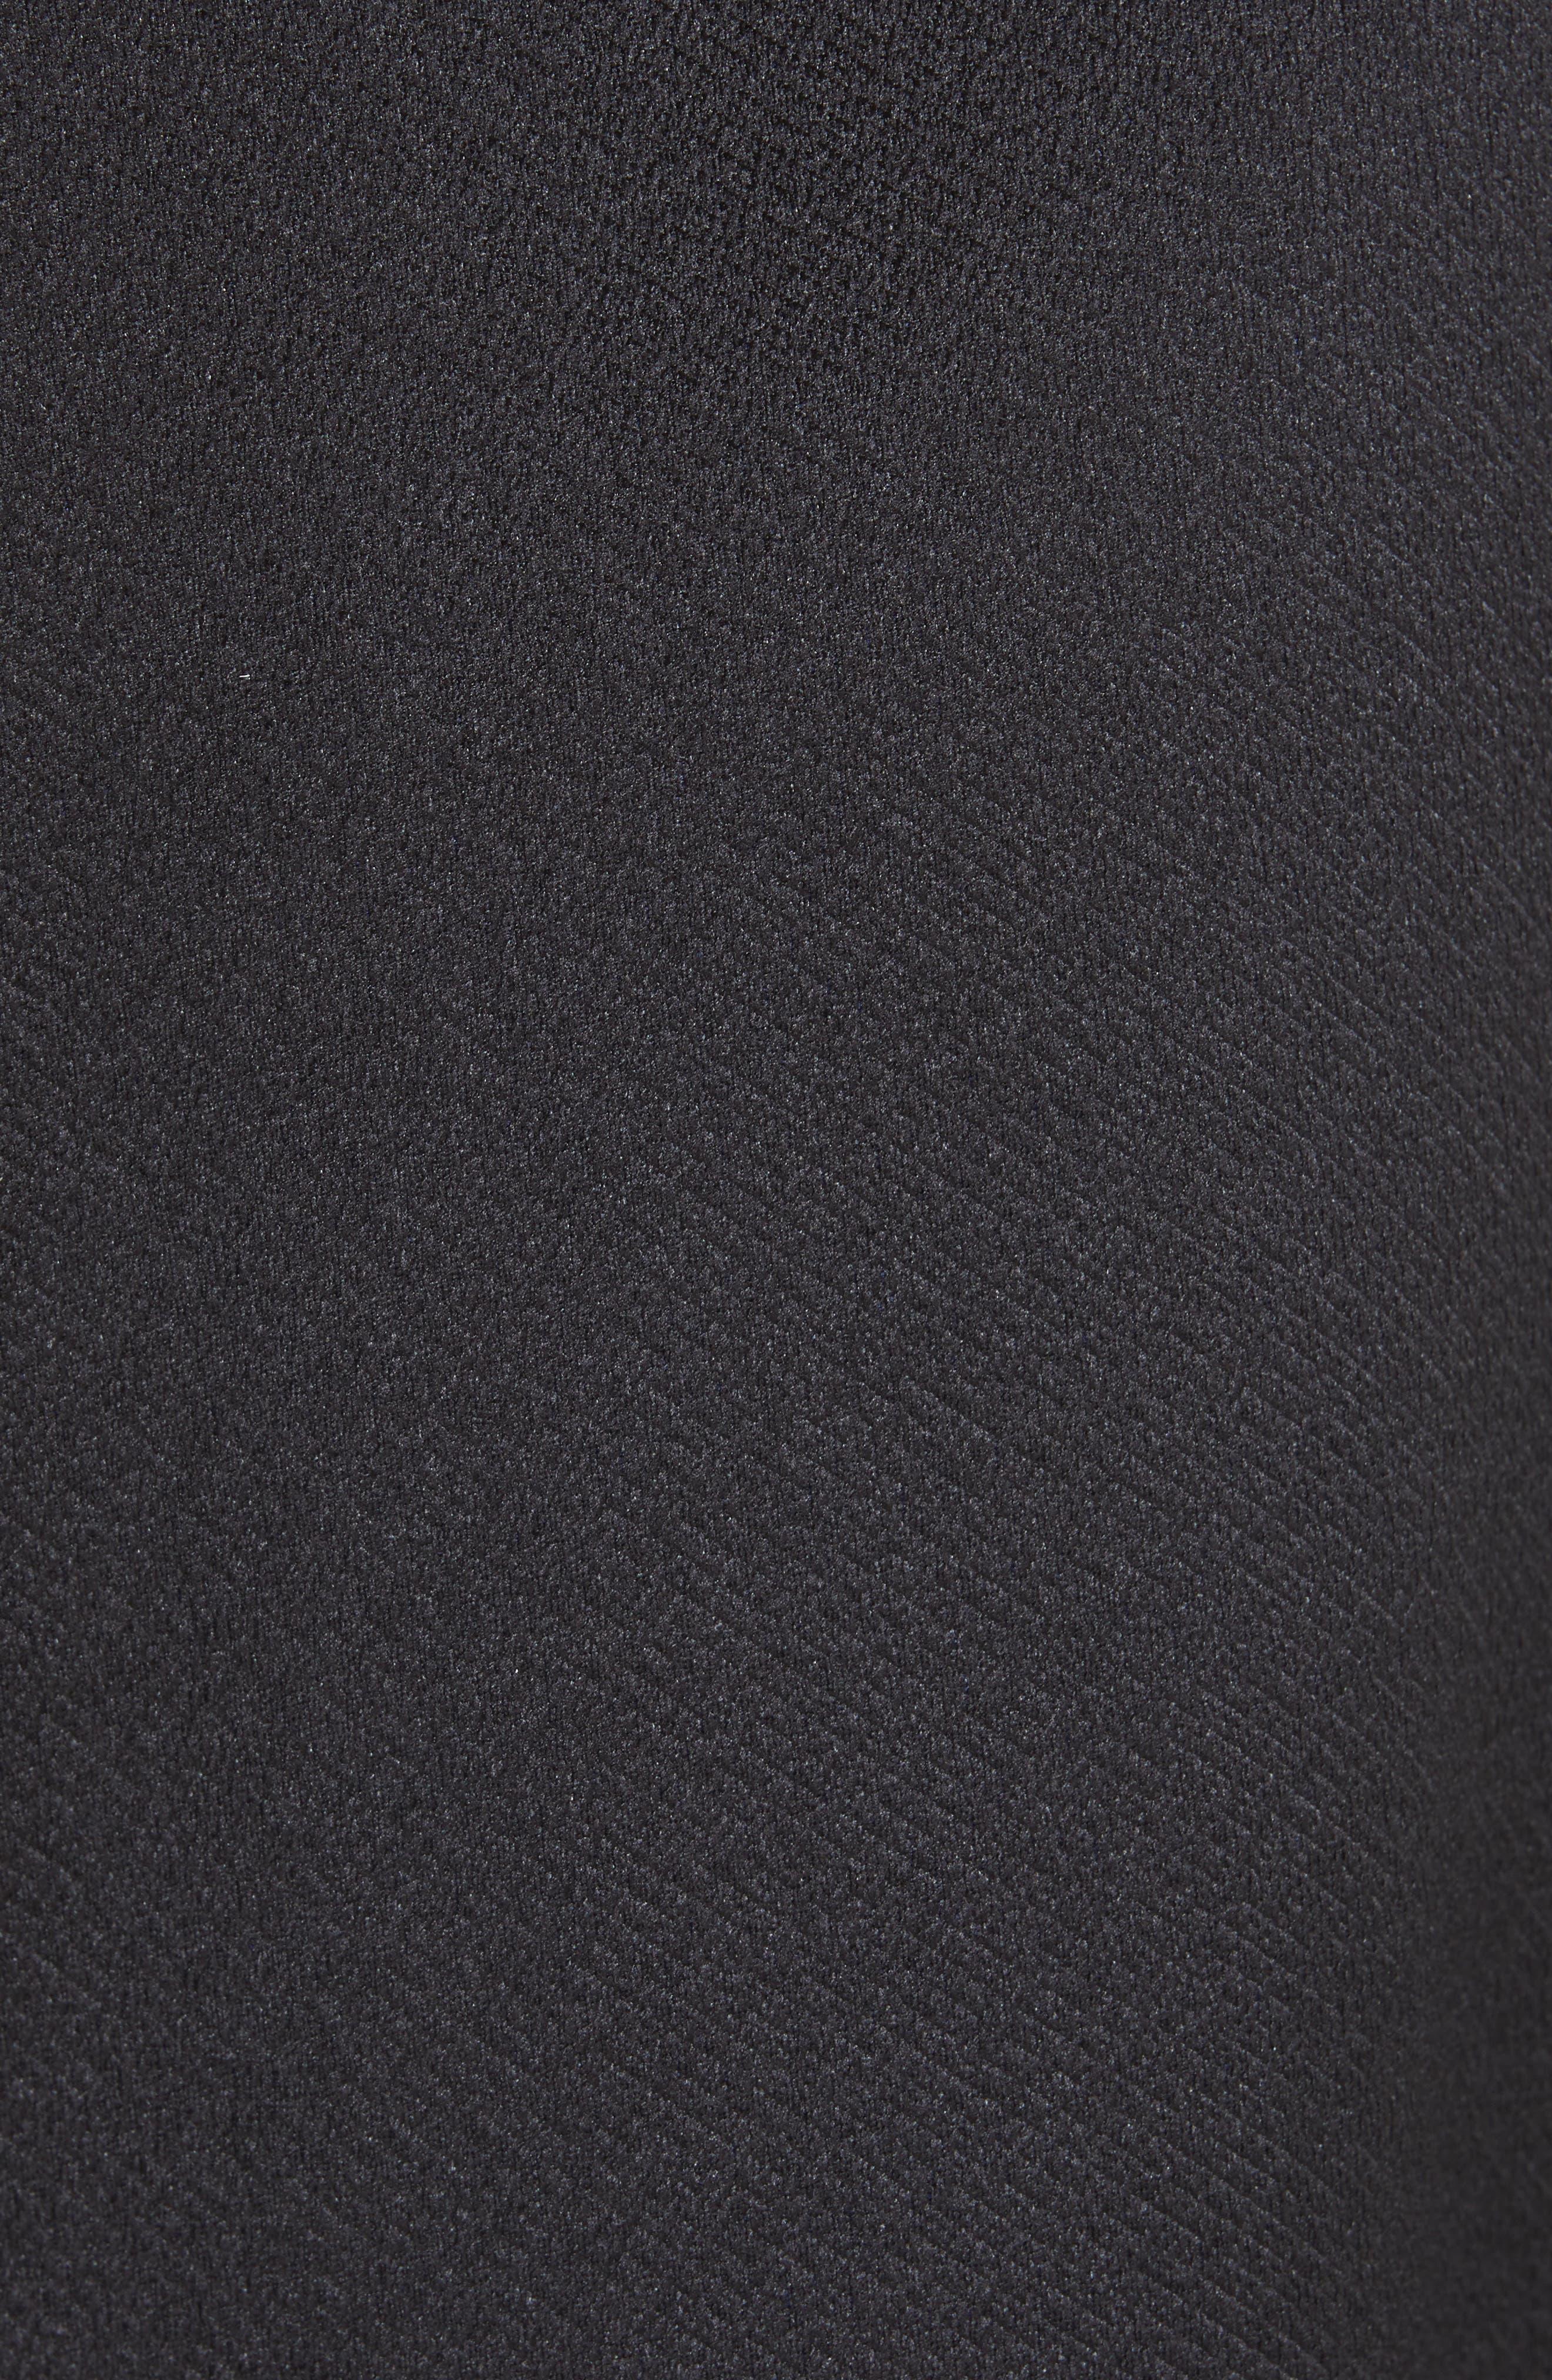 JASON WU COLLECTION,                             Double Face Cocktail Dress,                             Alternate thumbnail 5, color,                             BLACK